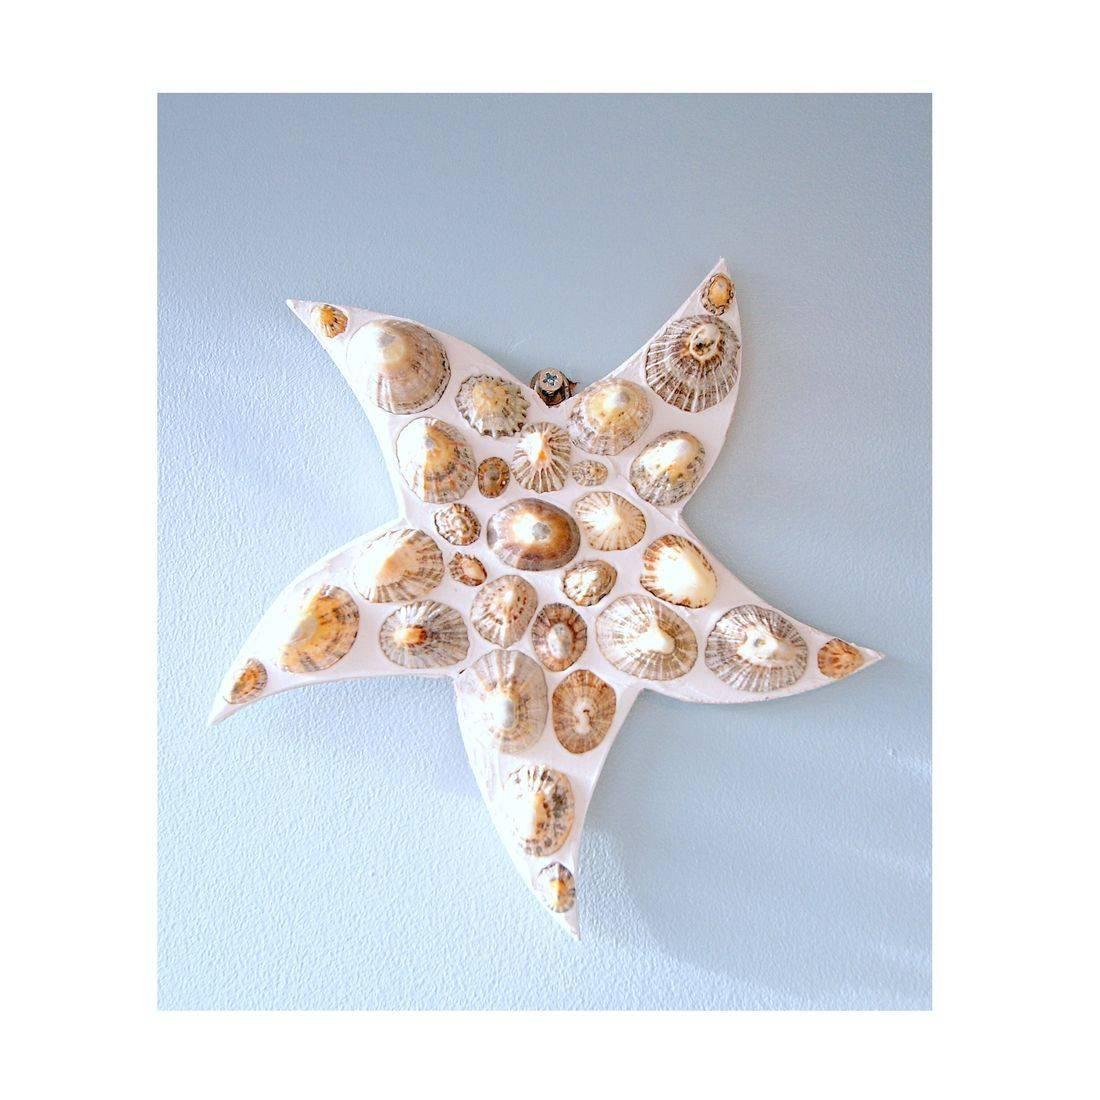 15 Mosaic Shell limpit star fish